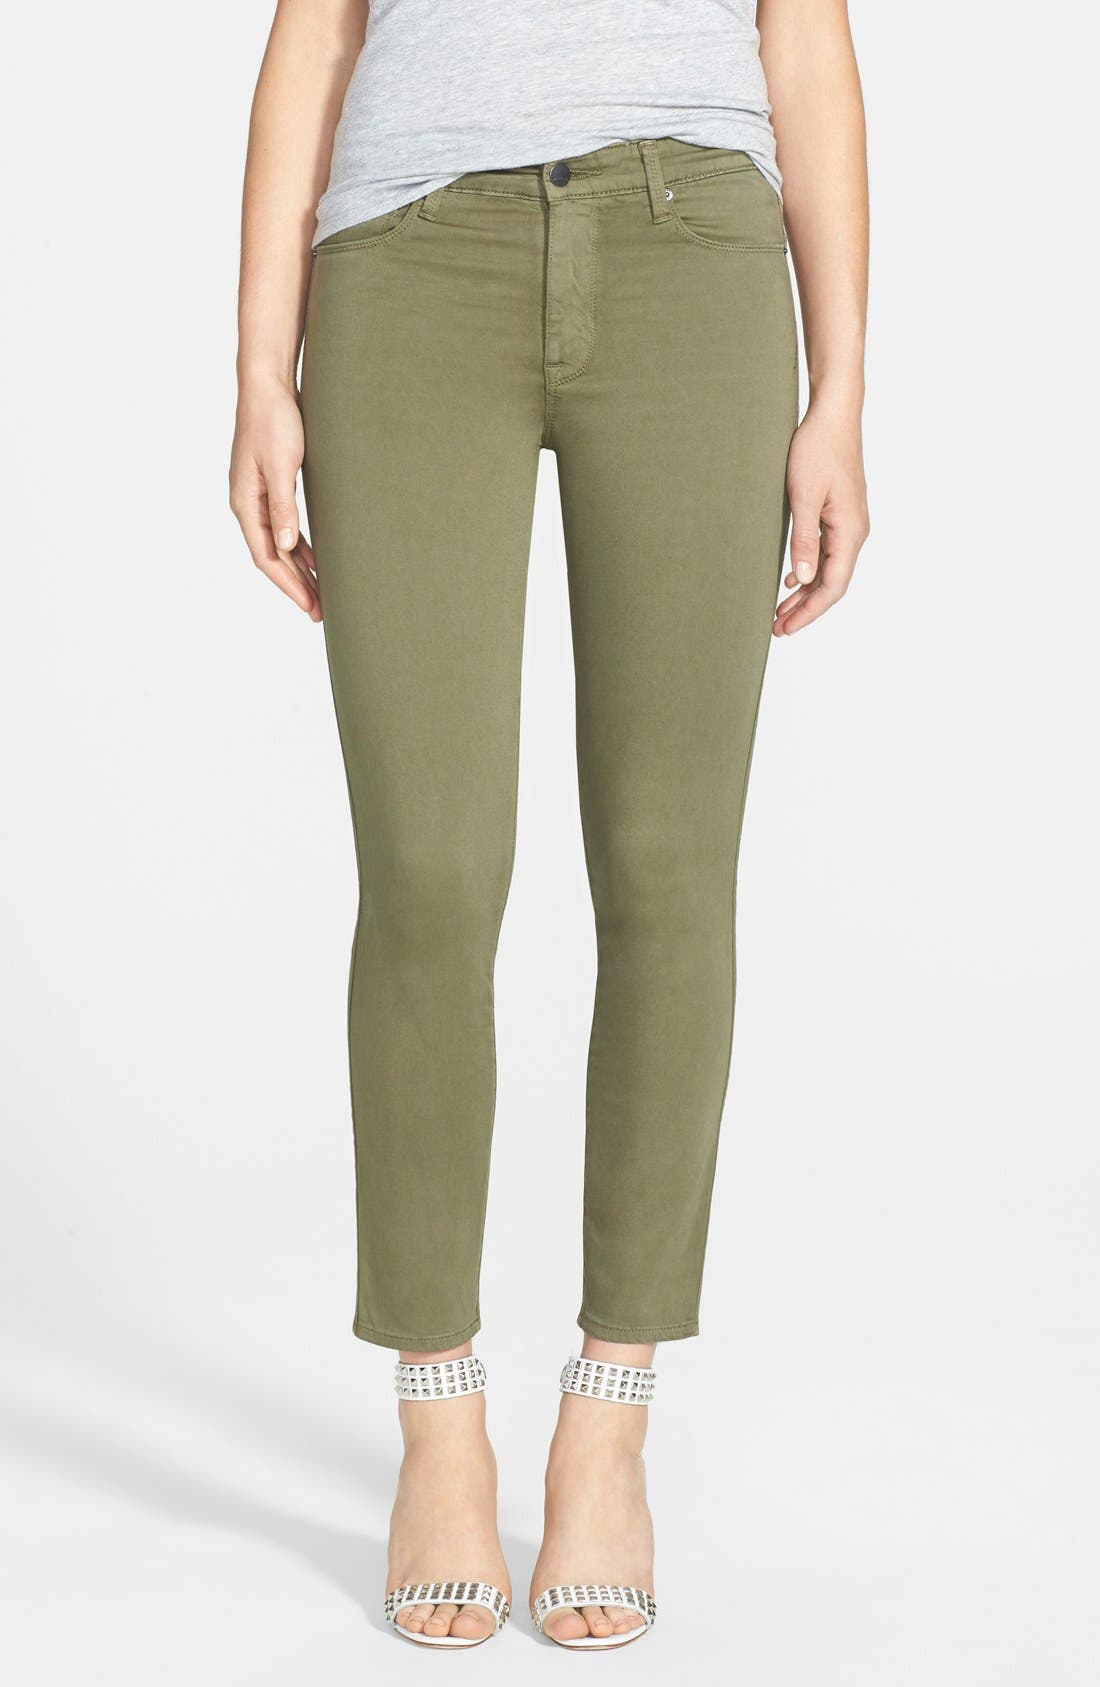 Alternate Image 1 Selected - Genetic 'Loren' Crop Skinny Jeans (Clash)